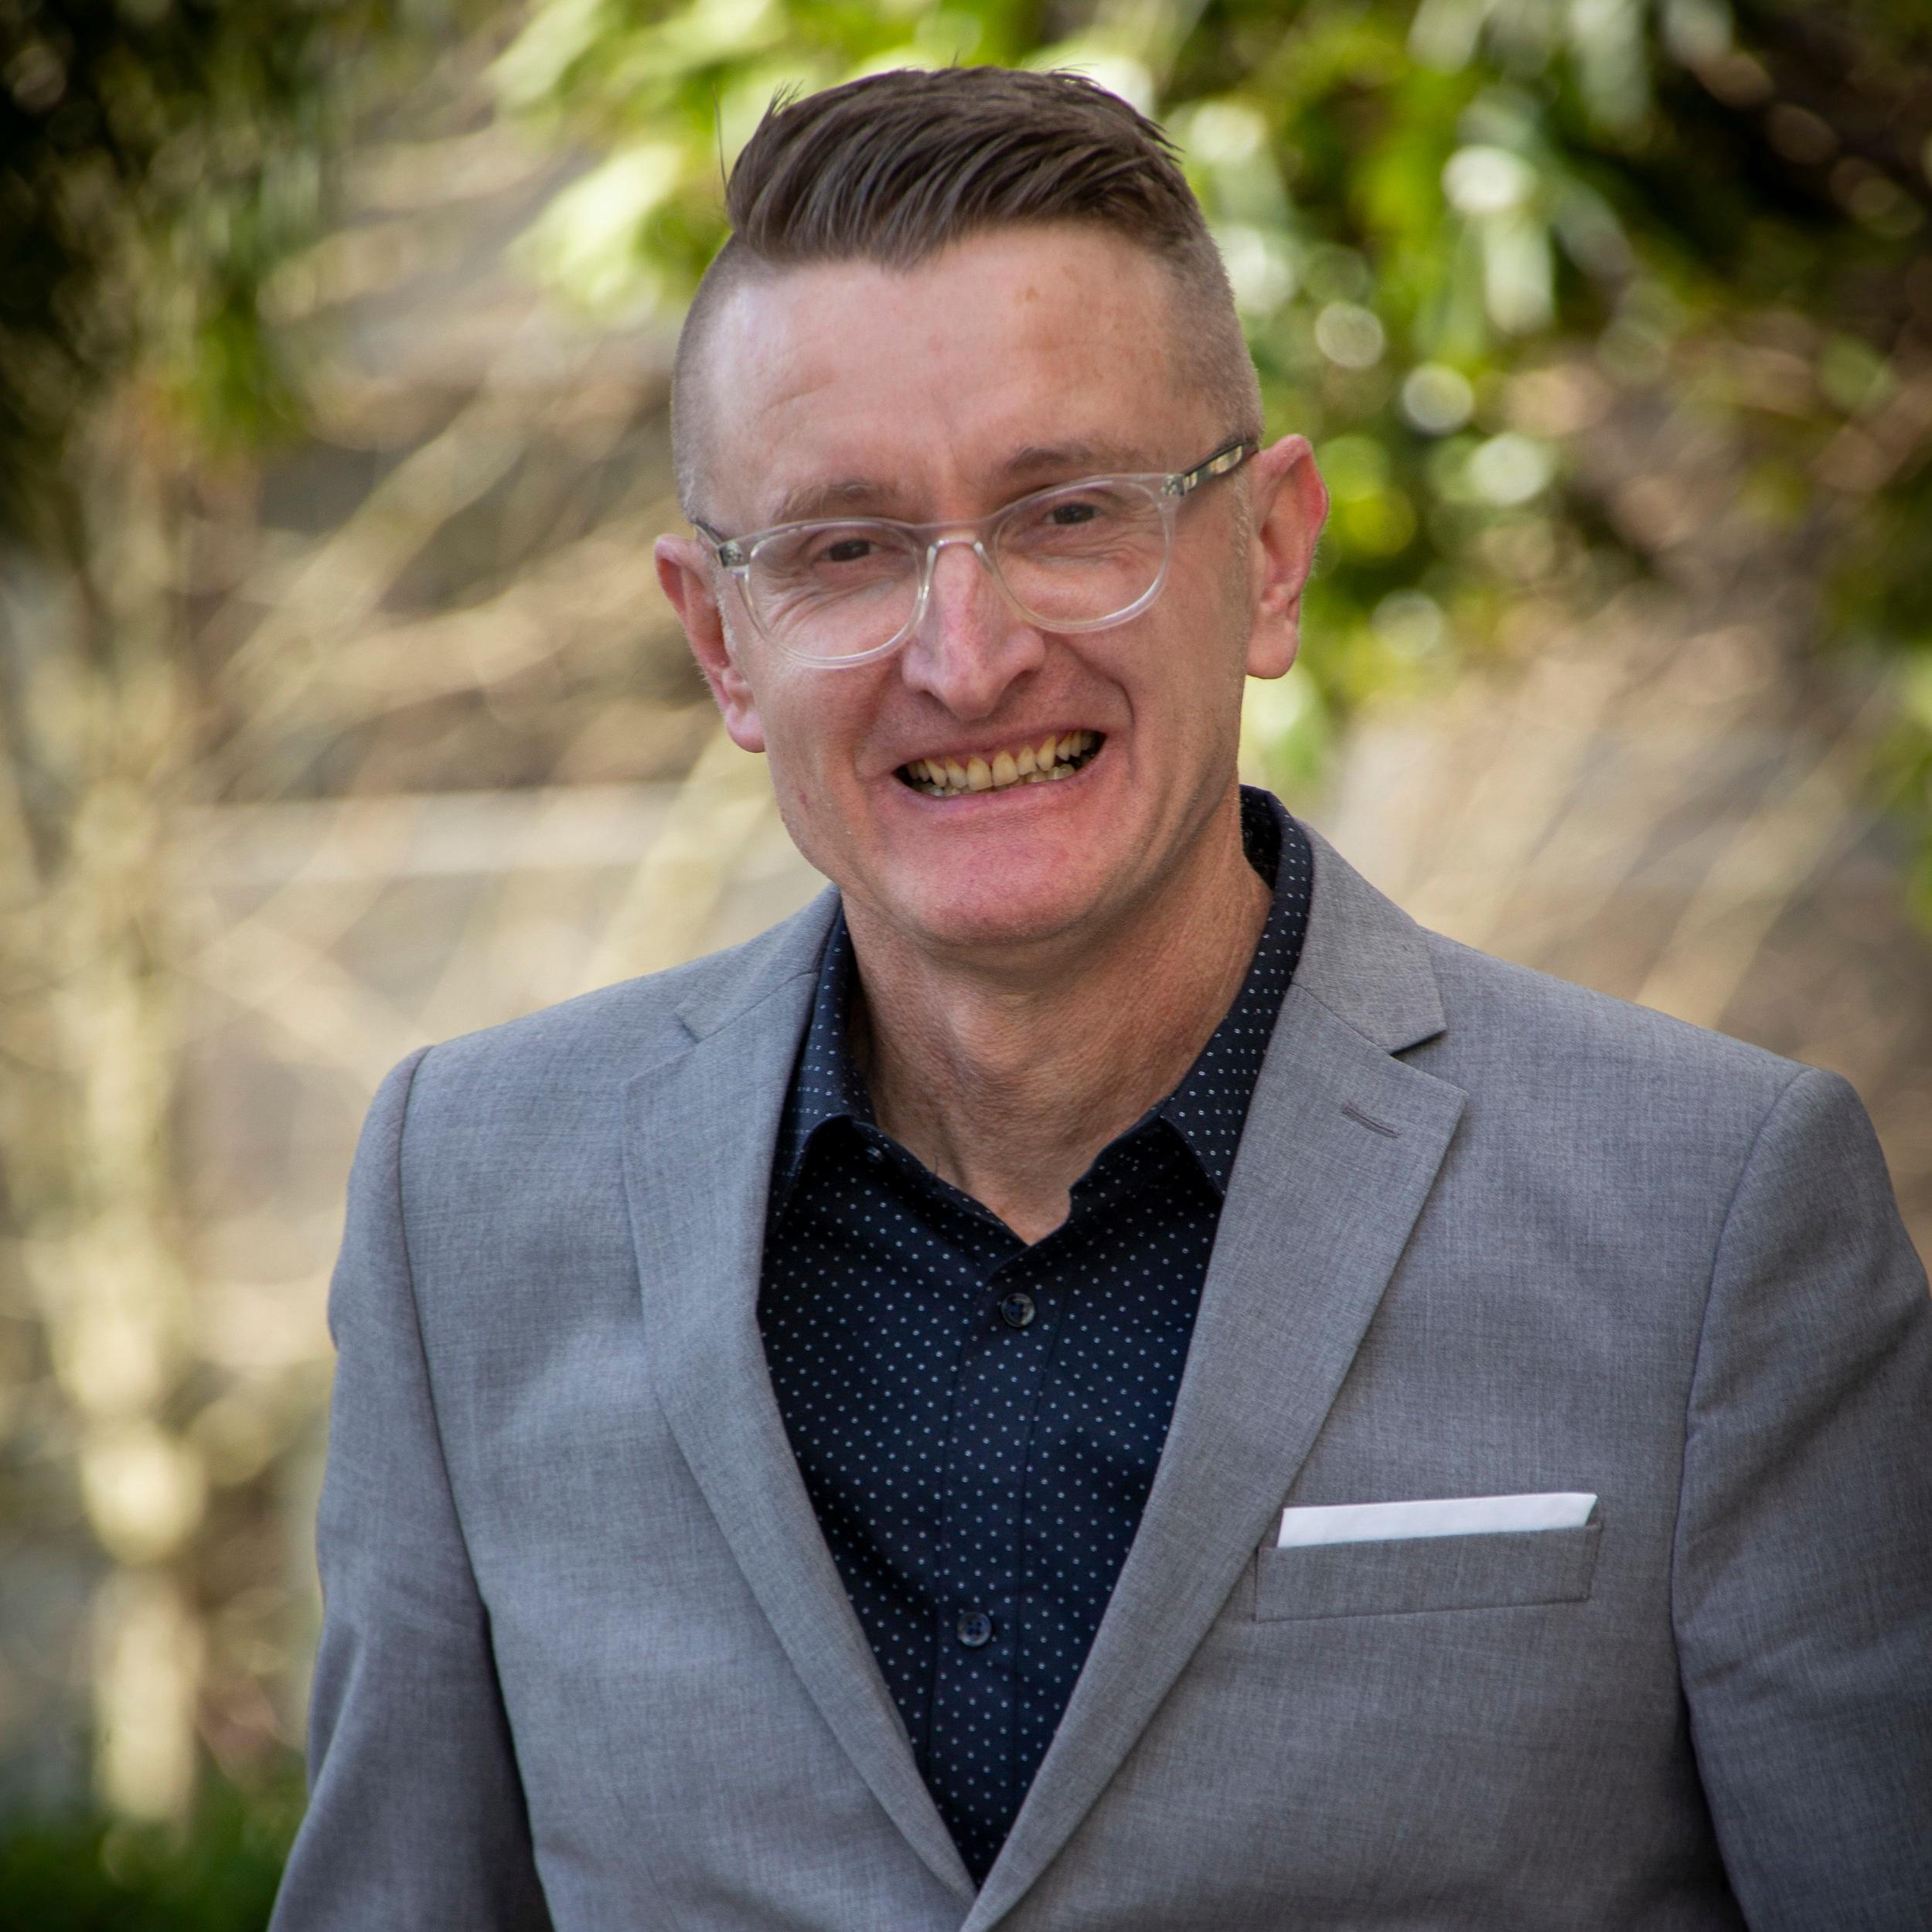 Associate Professor Chris Wilkins Associate Professor - SHORE Drugs Team Leader  c.wilkins@massey.ac.nz